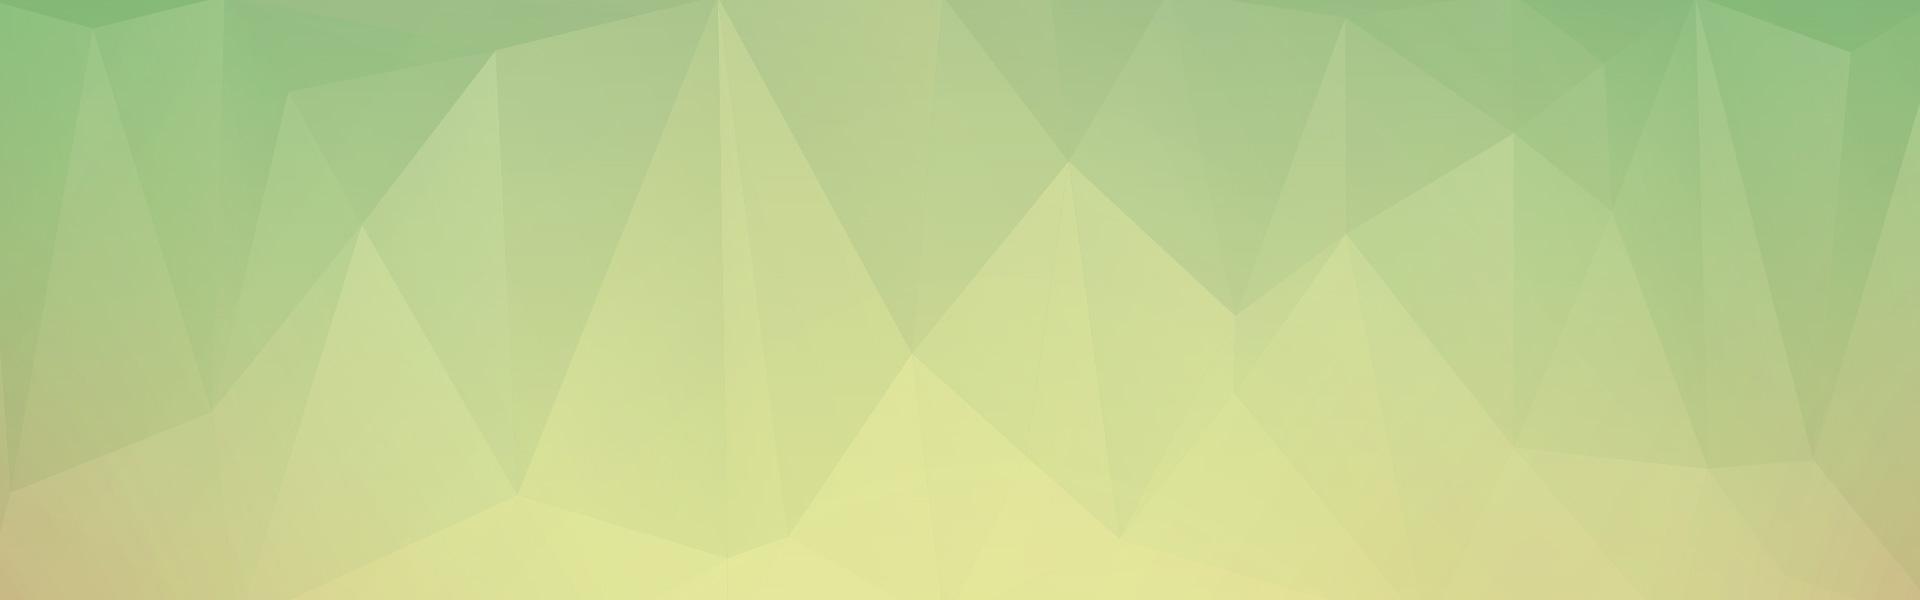 CTA_Backgrounds-03_02